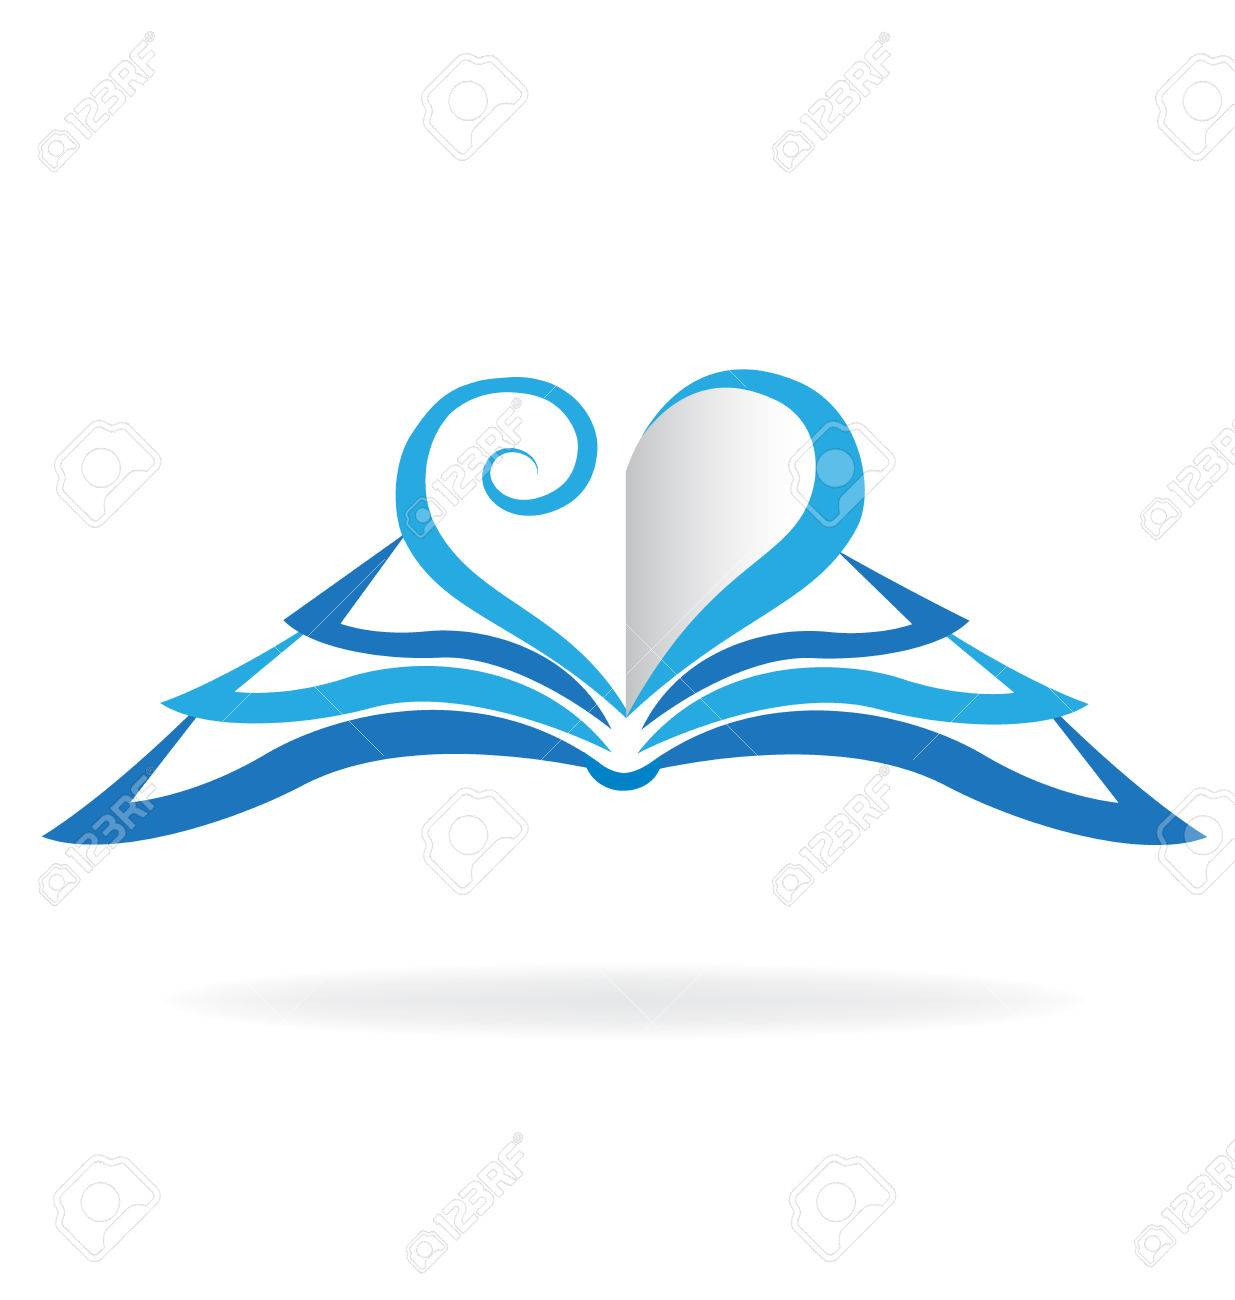 Book blue heart love shape icon. Education concept template - 63241166